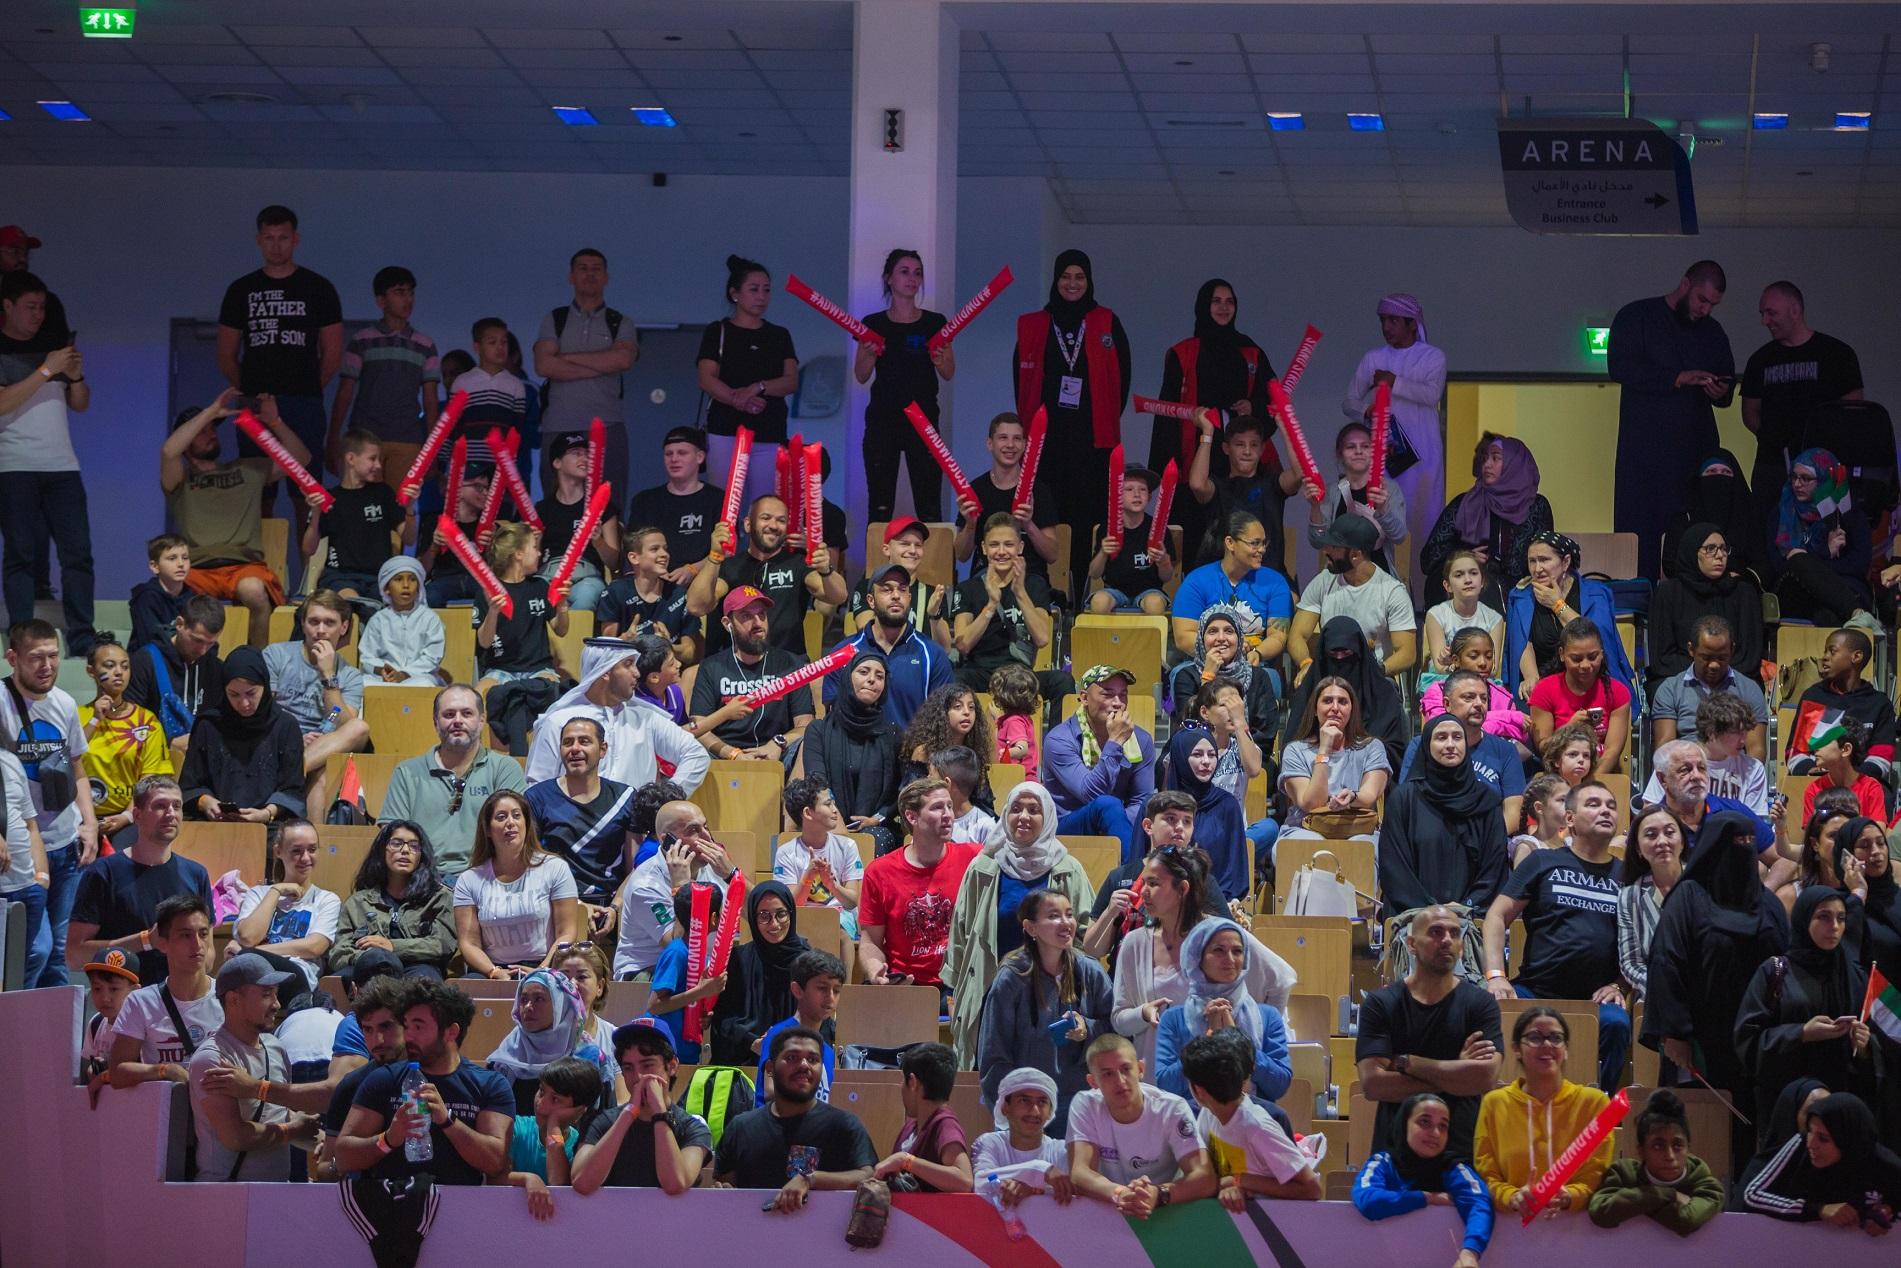 abu dhabi world professional jiu-jitsu championship shows jiu-jitsu is a sport for all 7.jpg